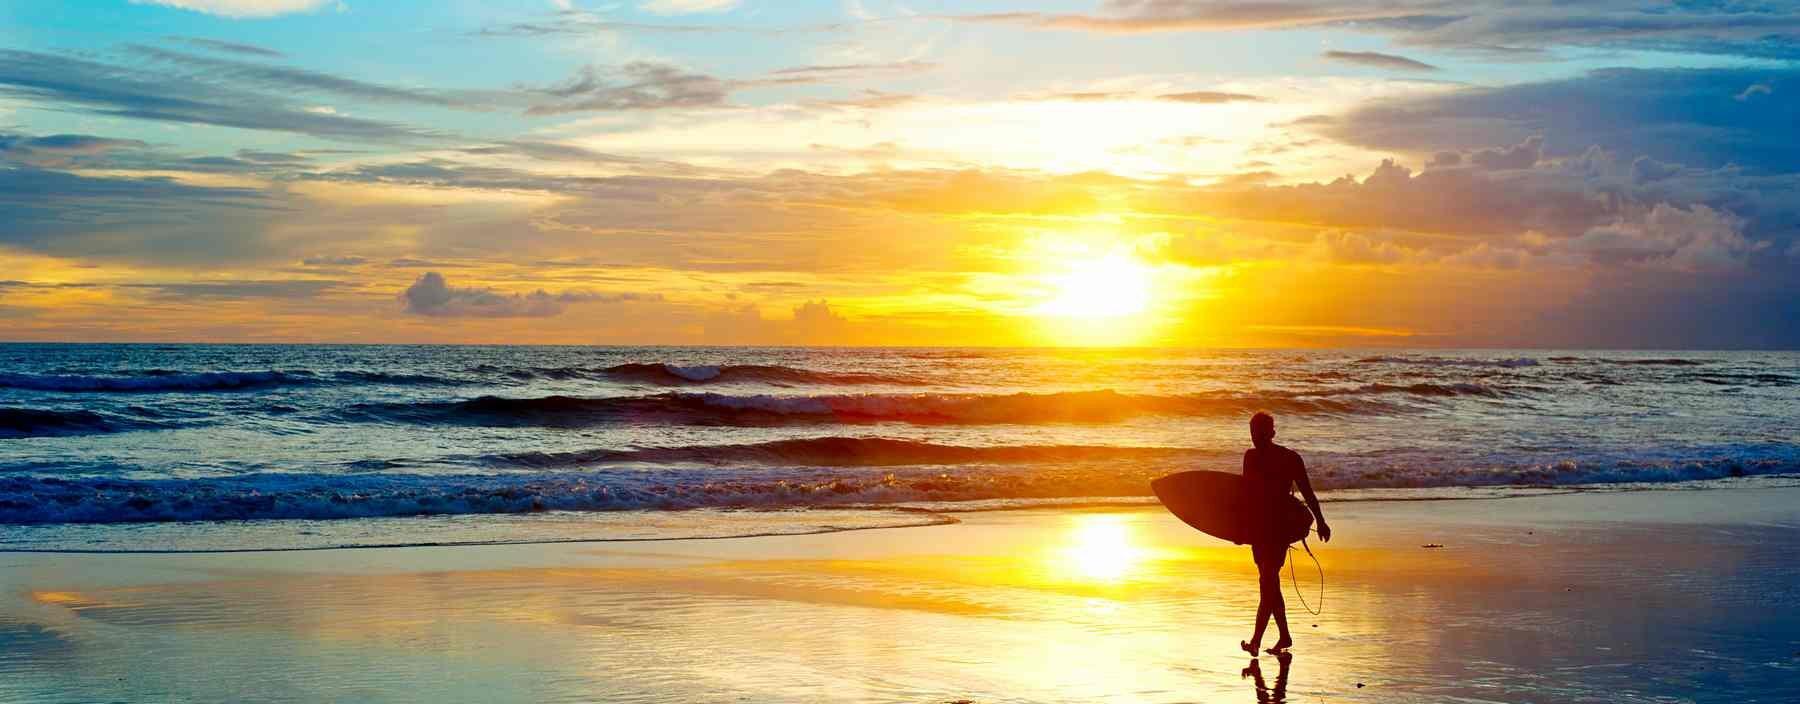 id, bali, algemeen, sunset.jpg